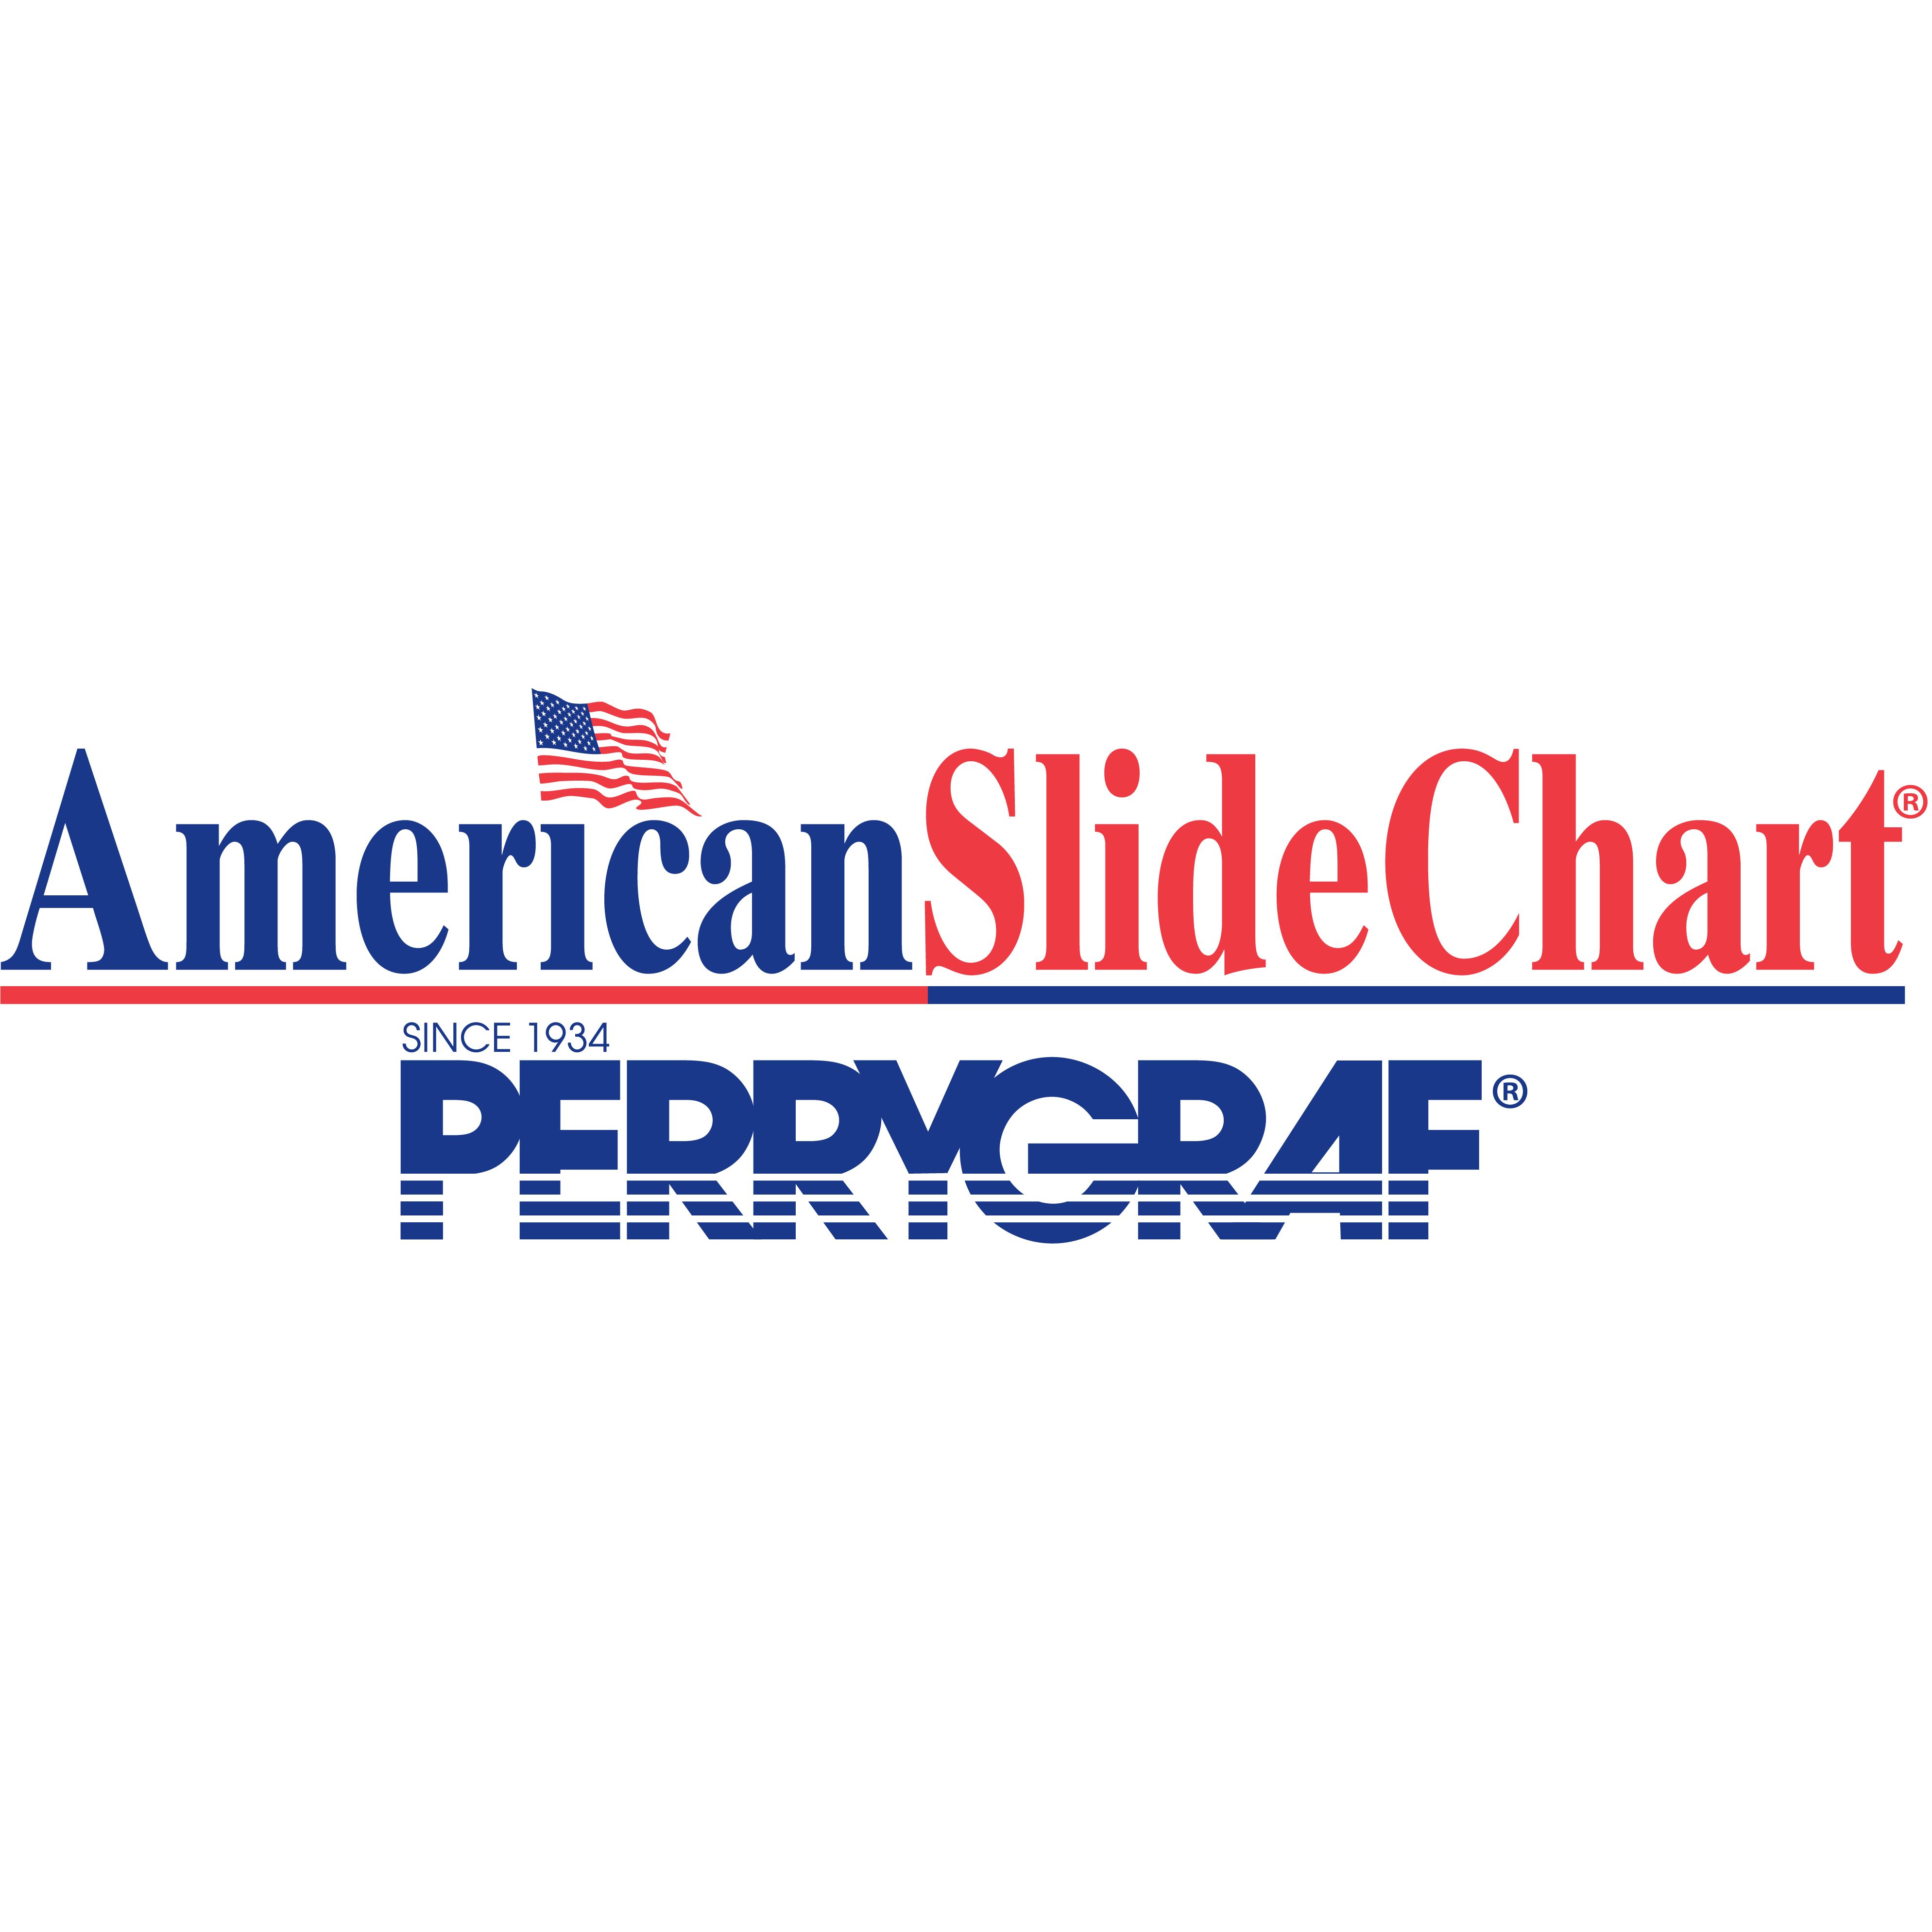 American Slide-Chart / Perrygraf - Carol Stream, IL - Copying & Printing Services